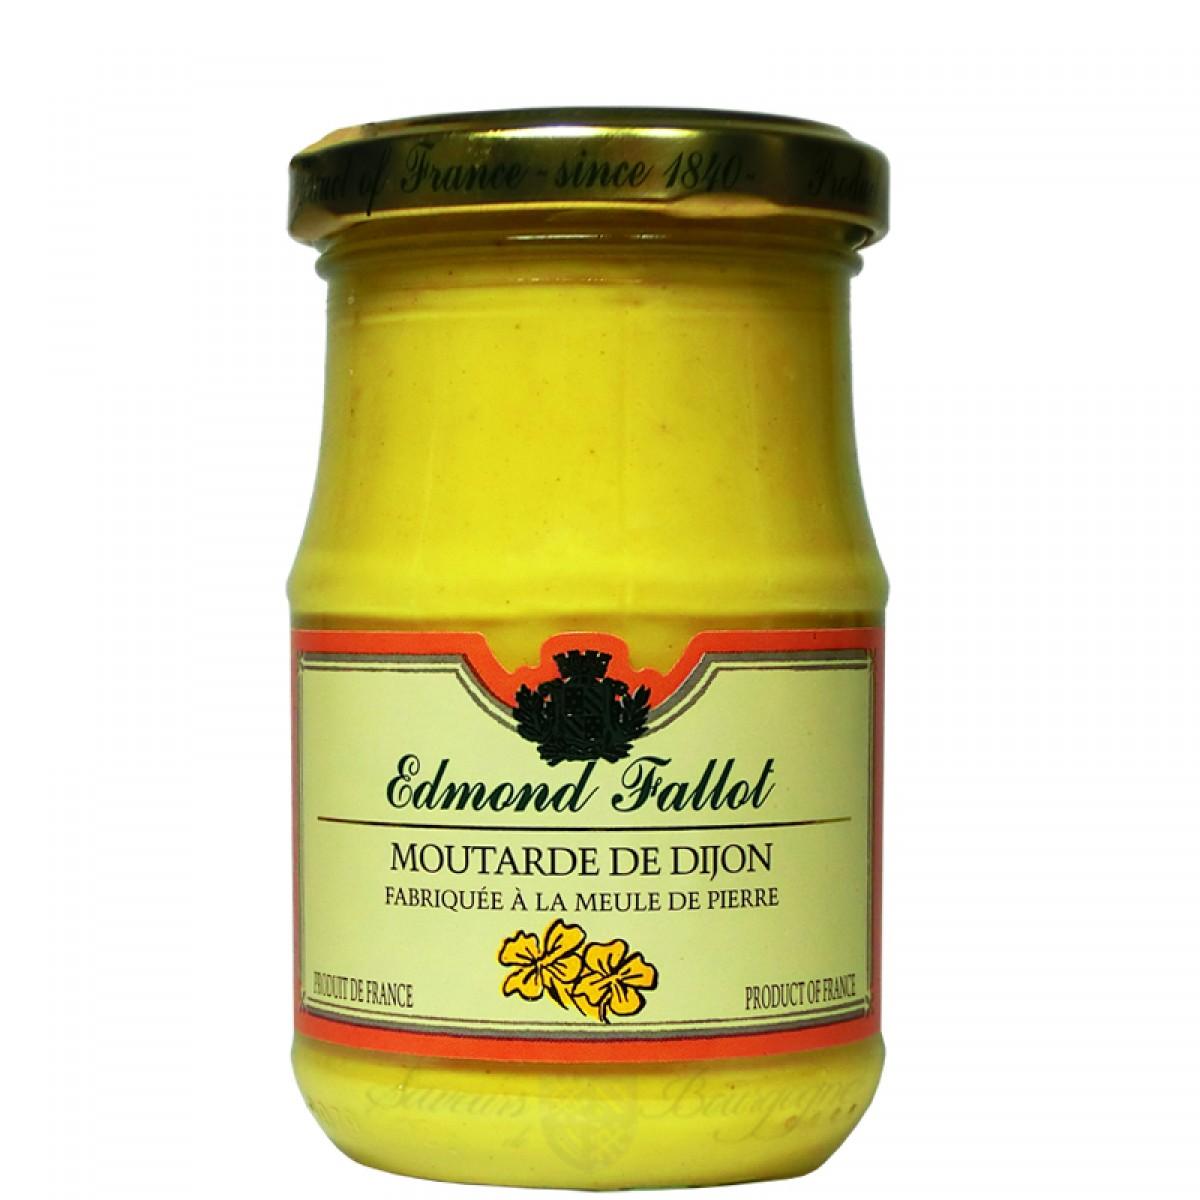 Moutarde de dijon 210g fallot saveurs de bourgogne vente de produits du t - Moutarde fallot vente ...